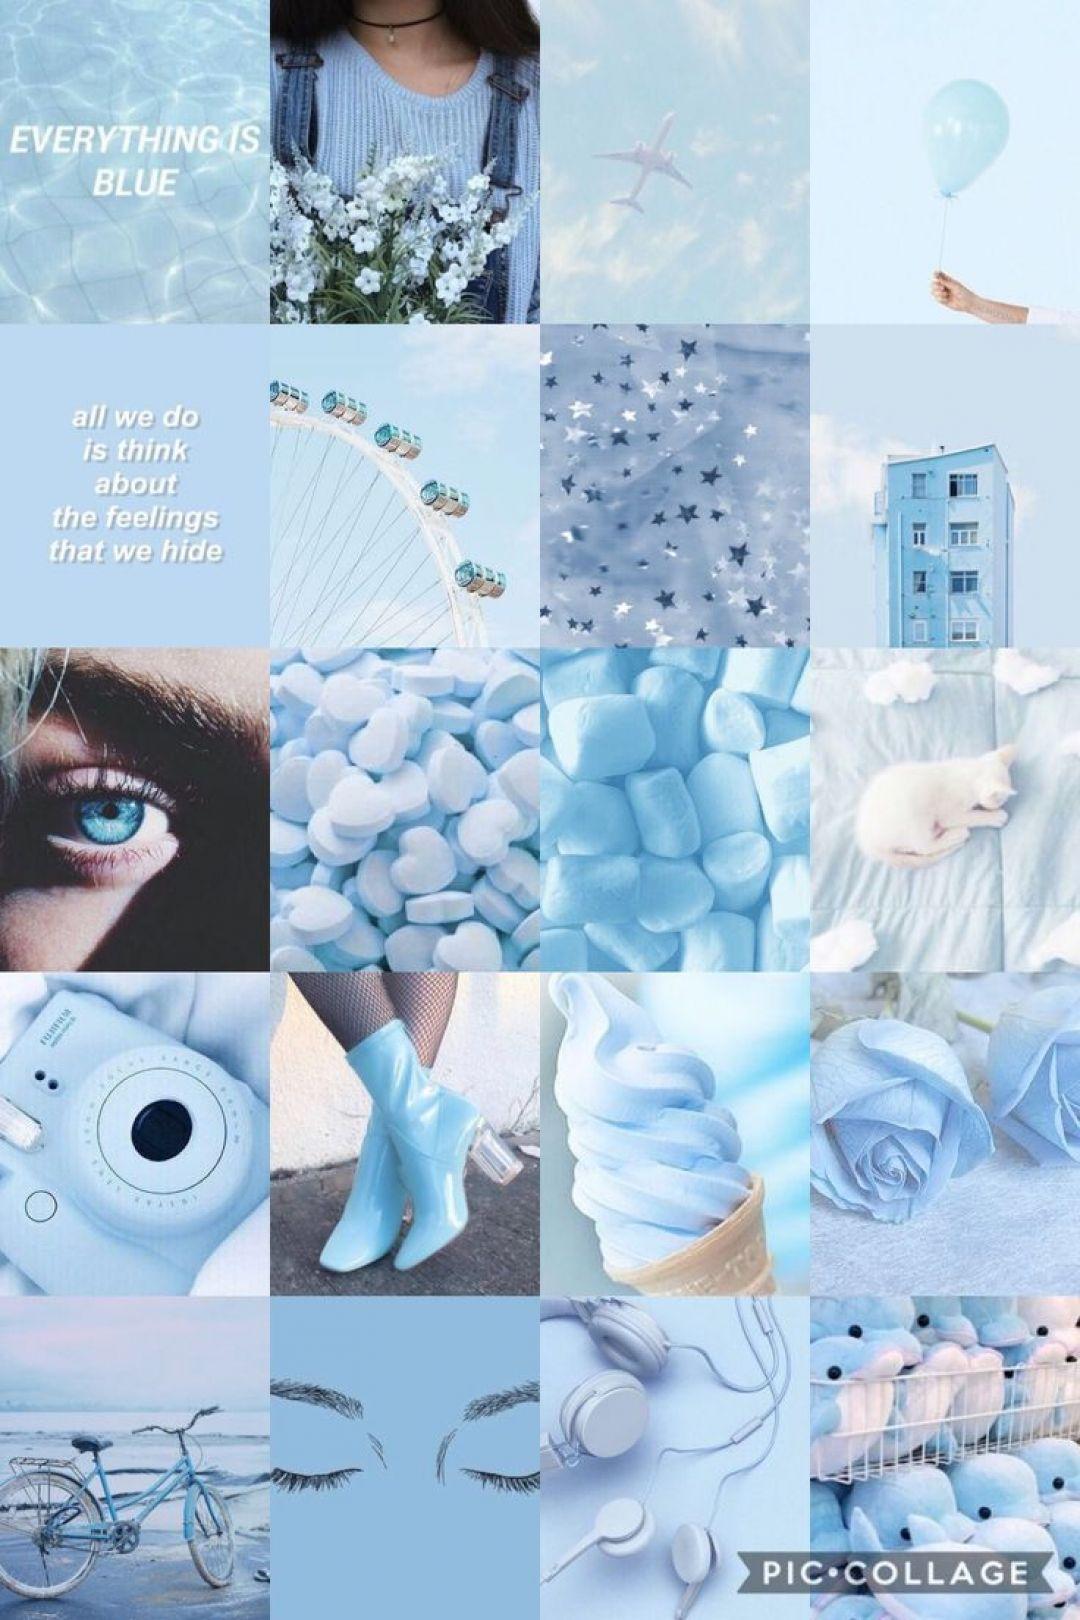 Blue Aesthetic Tumblr - Pastel Wallpaper Aesthetic Blue - HD Wallpaper